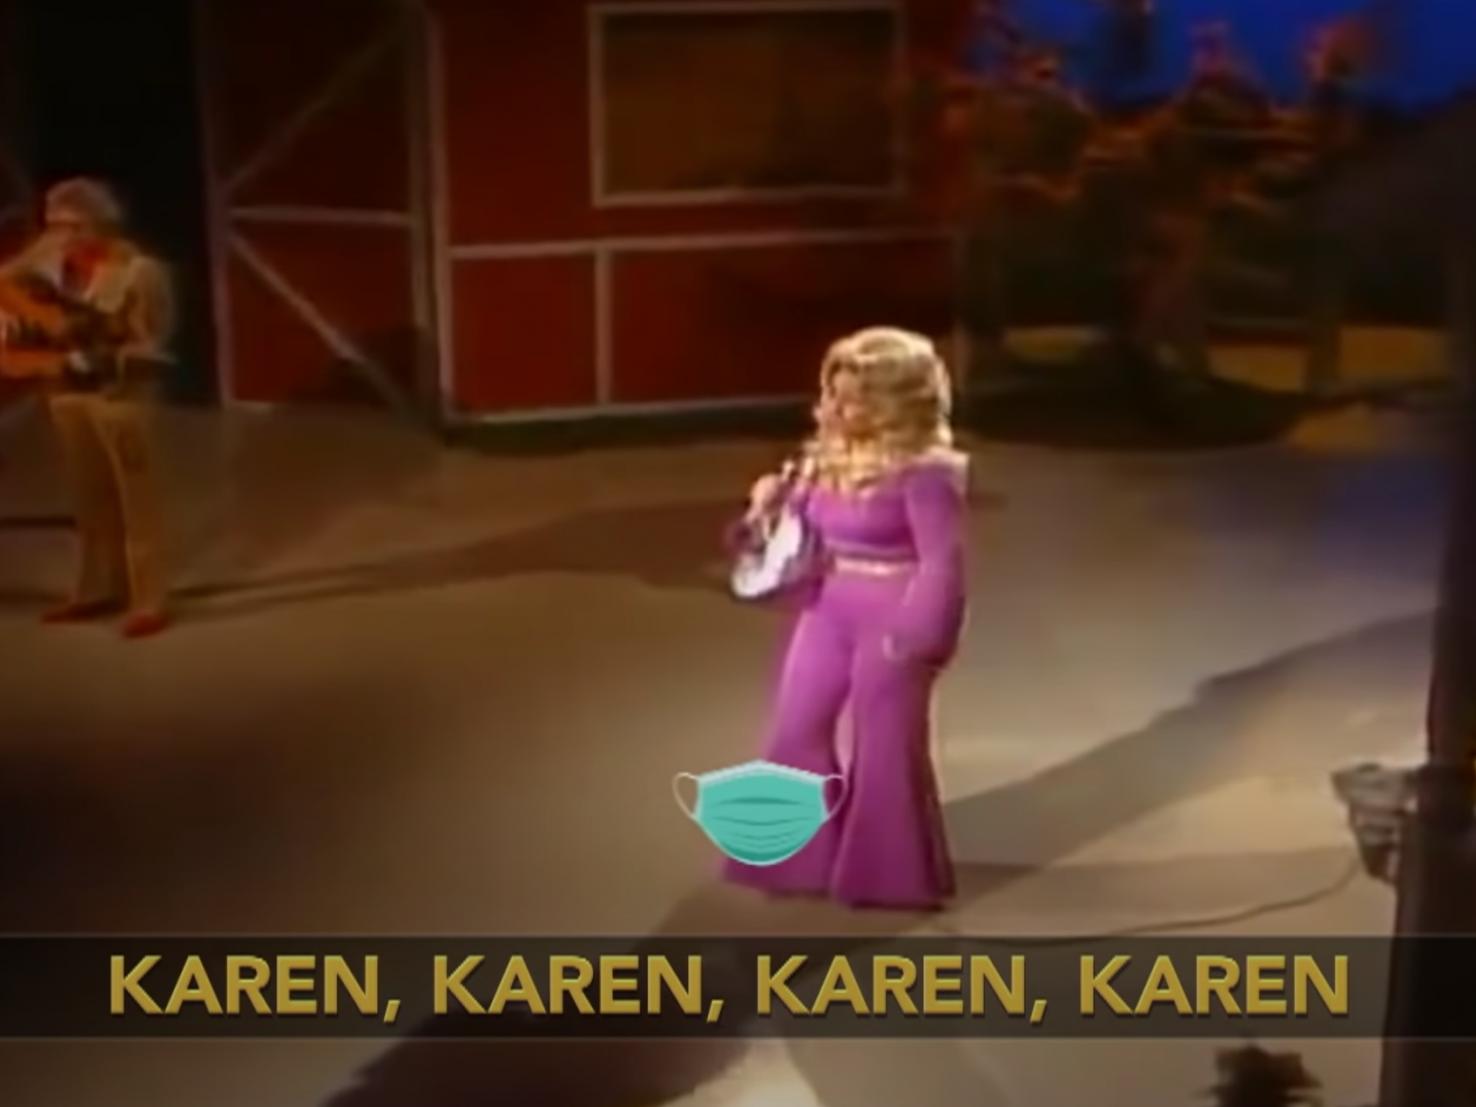 Hilarious Dolly Parton parody reimagines 'Jolene' as mask-wearing PSA for 'Karens'